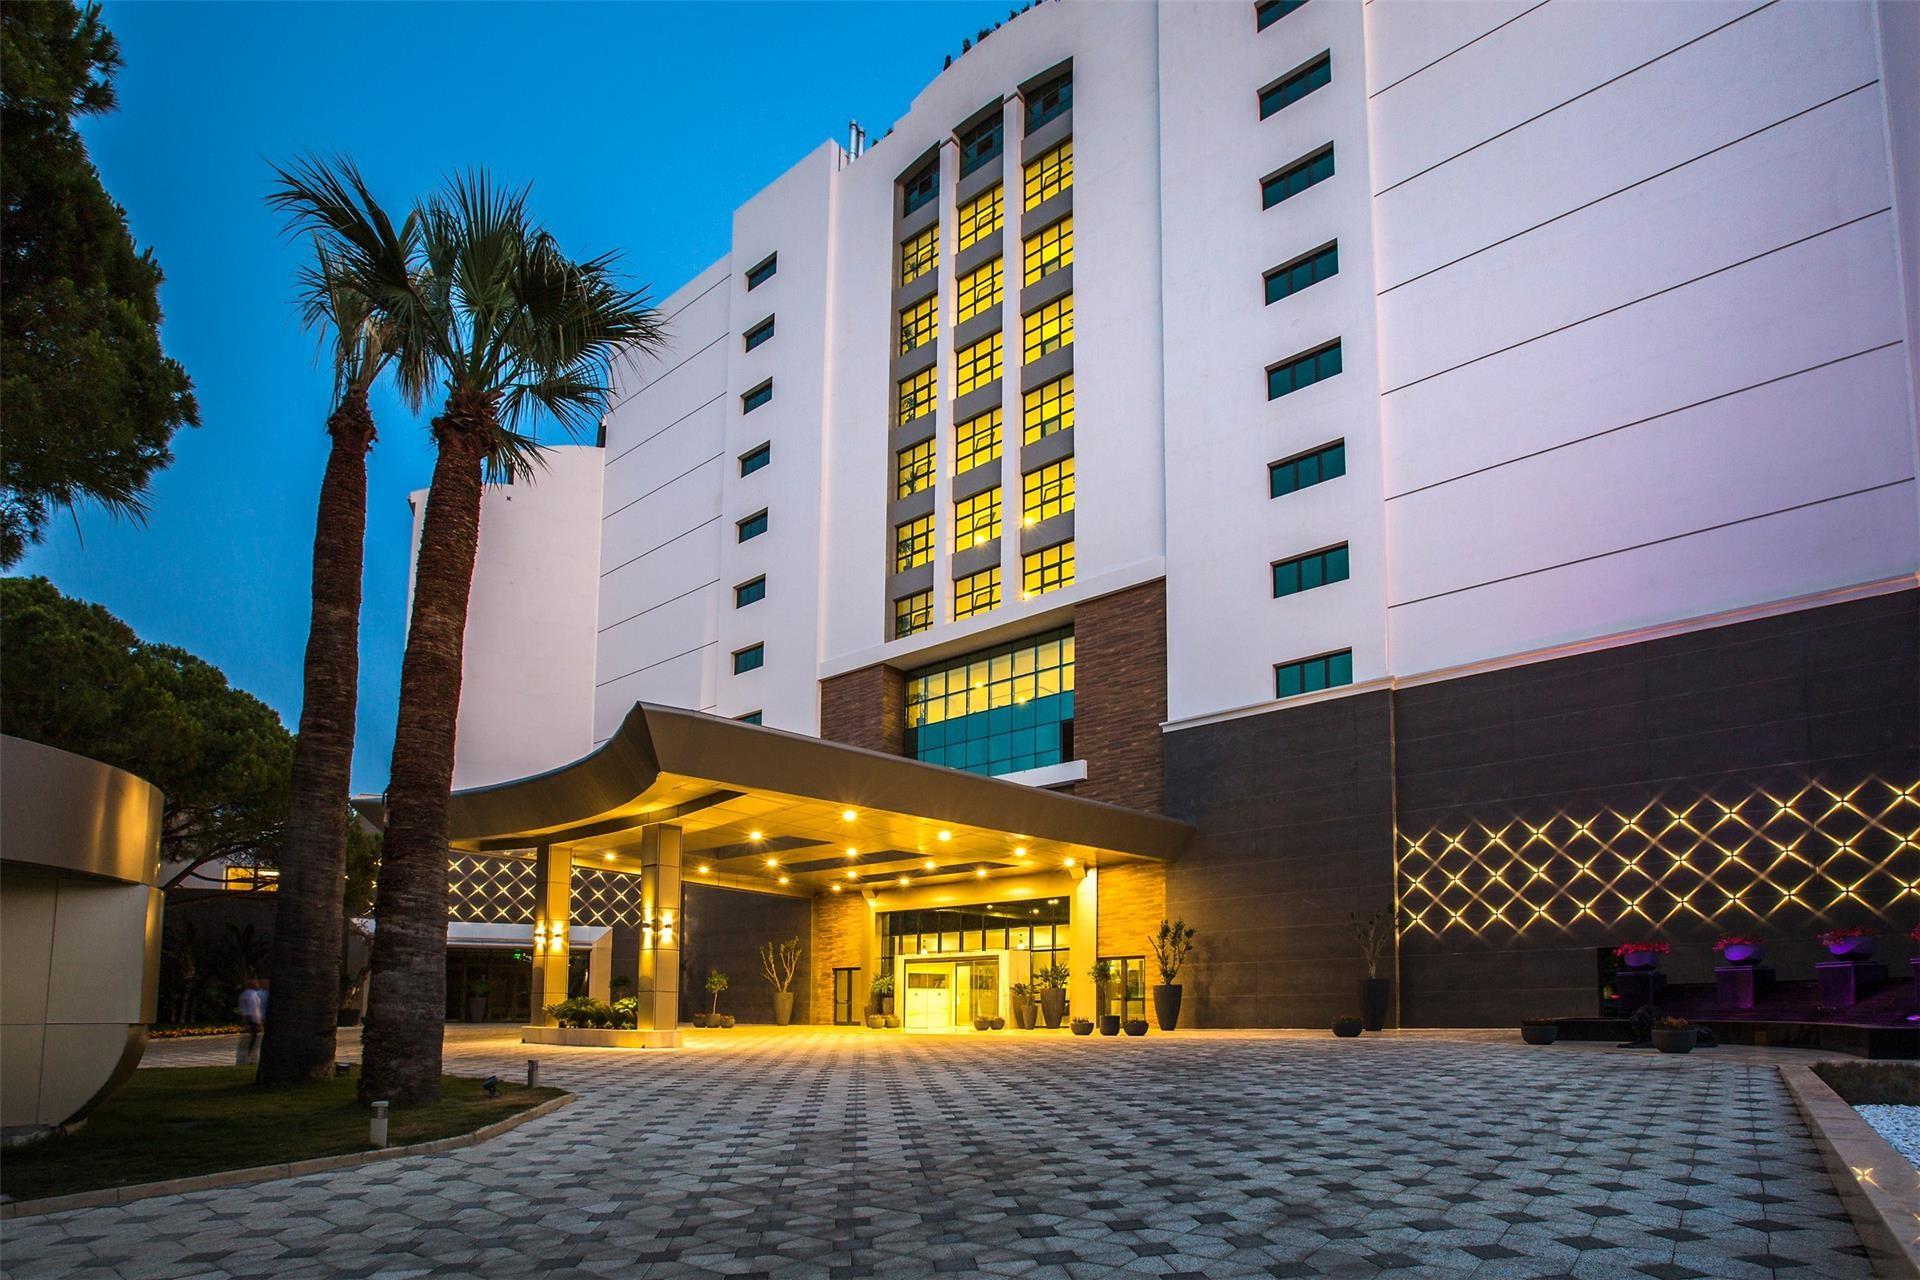 Amara Sealight Hotel - общ изглед нощ